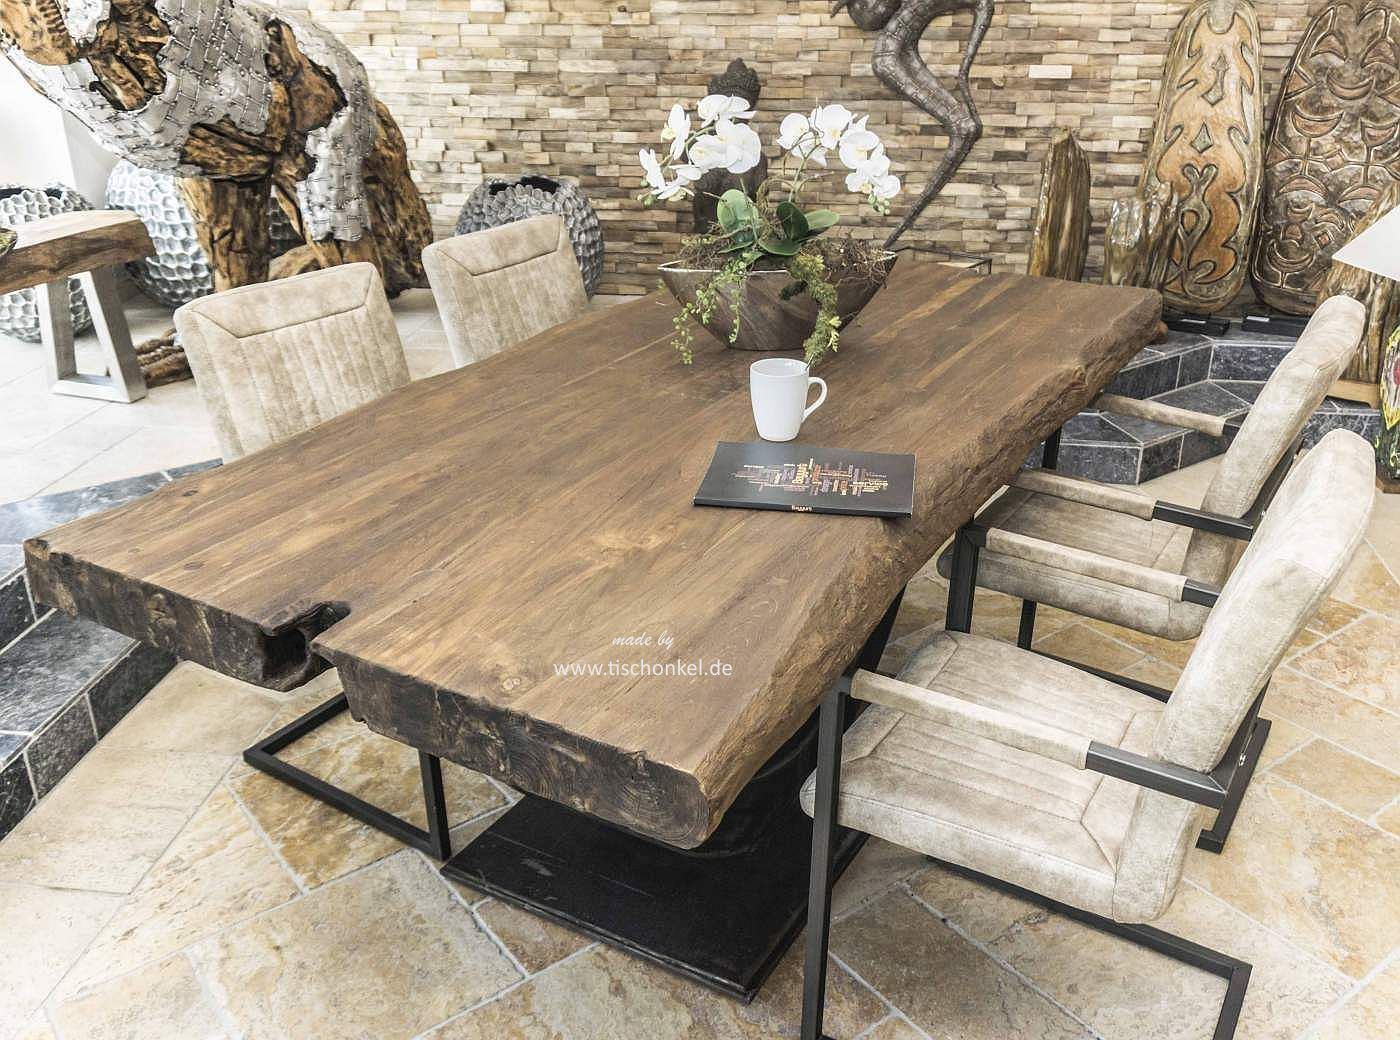 designer esstisch mit massiver tischplatte der tischonkel. Black Bedroom Furniture Sets. Home Design Ideas